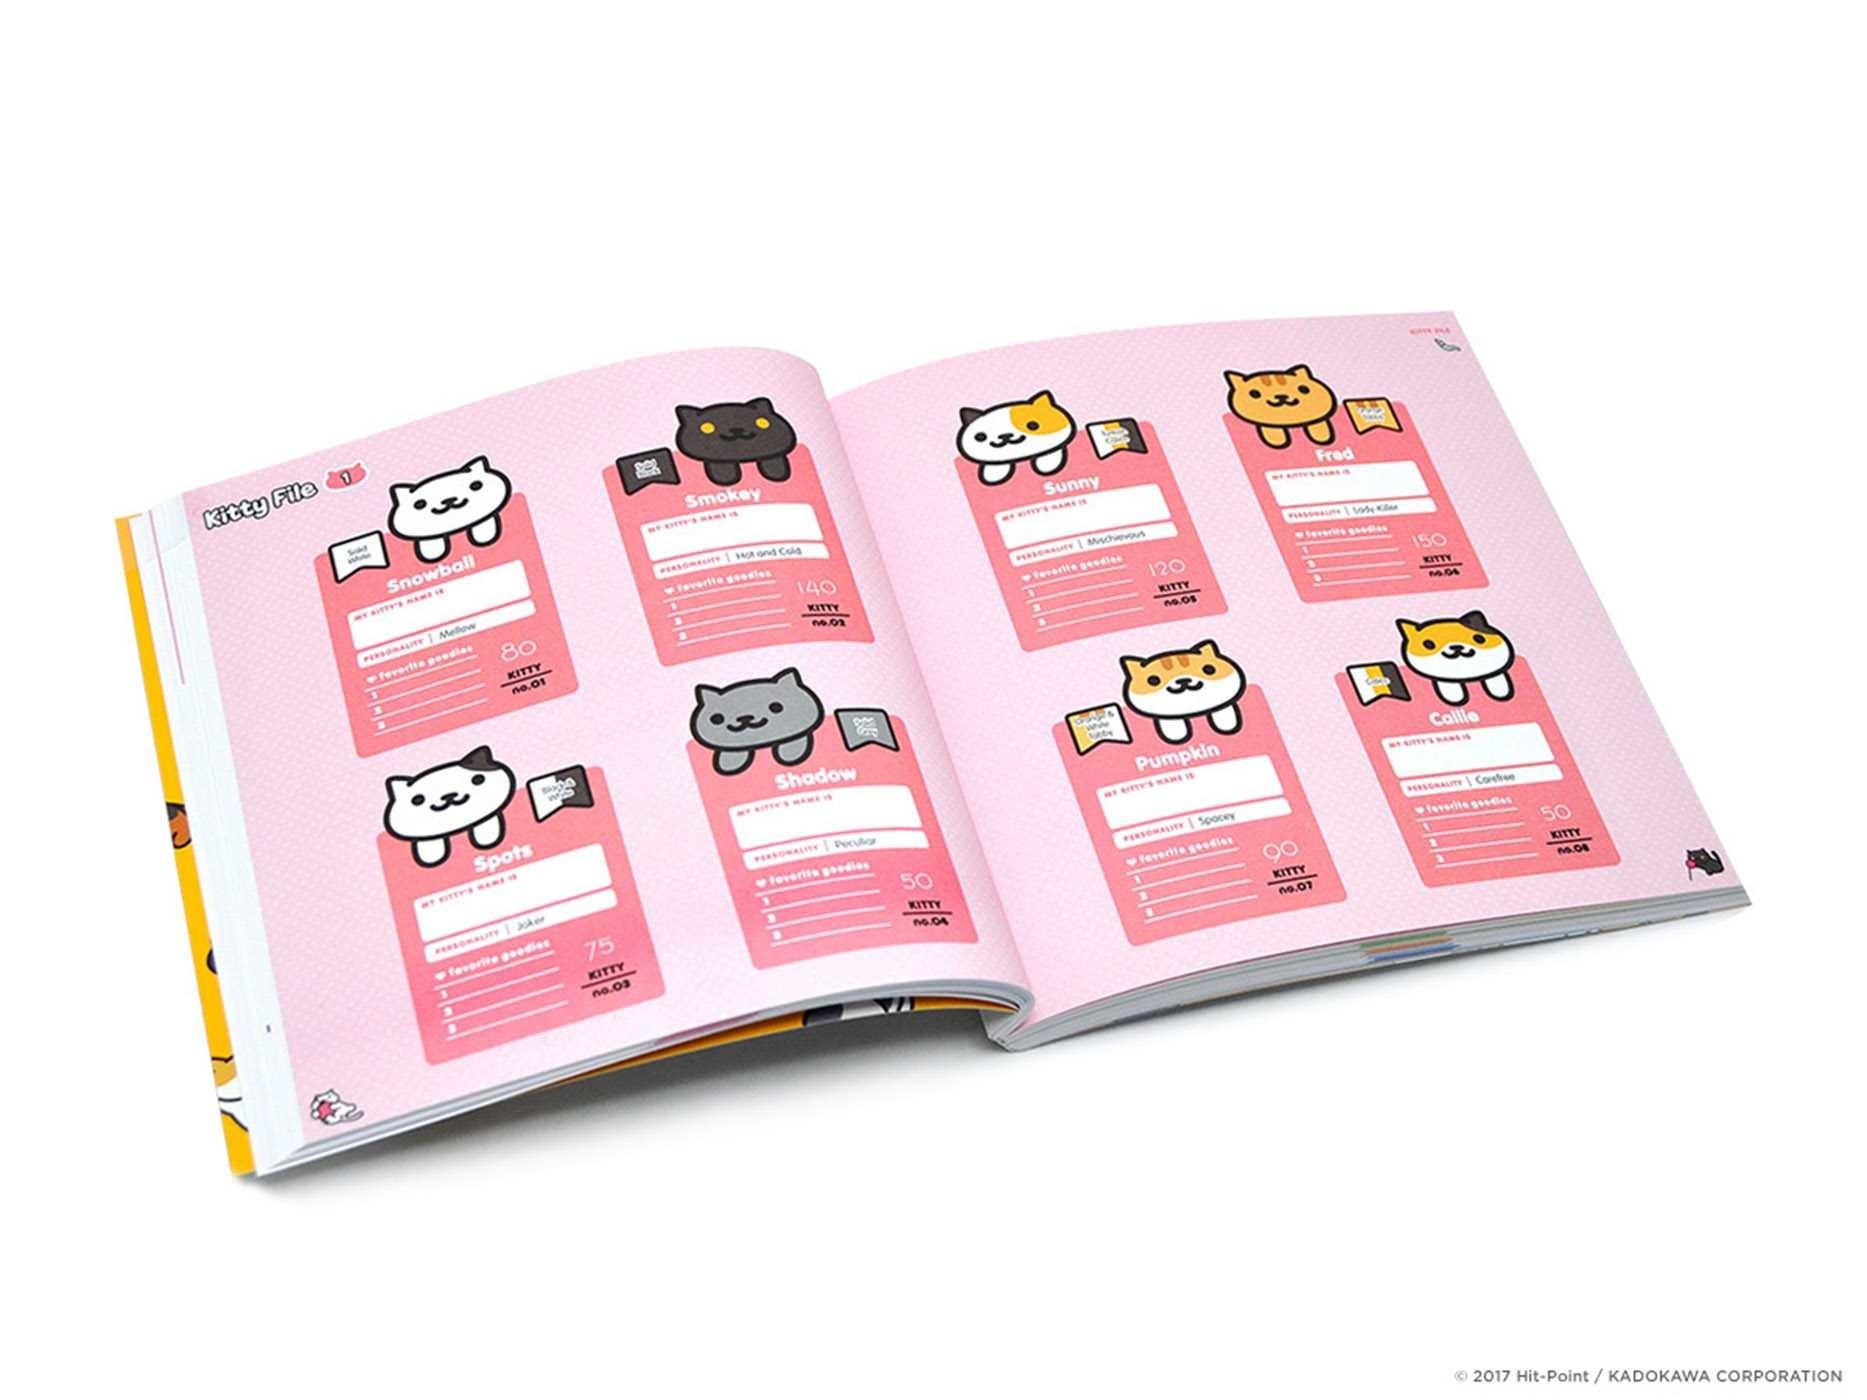 Neko atsume kitty collector haiku seasons of the kitty 9781421598024.in04